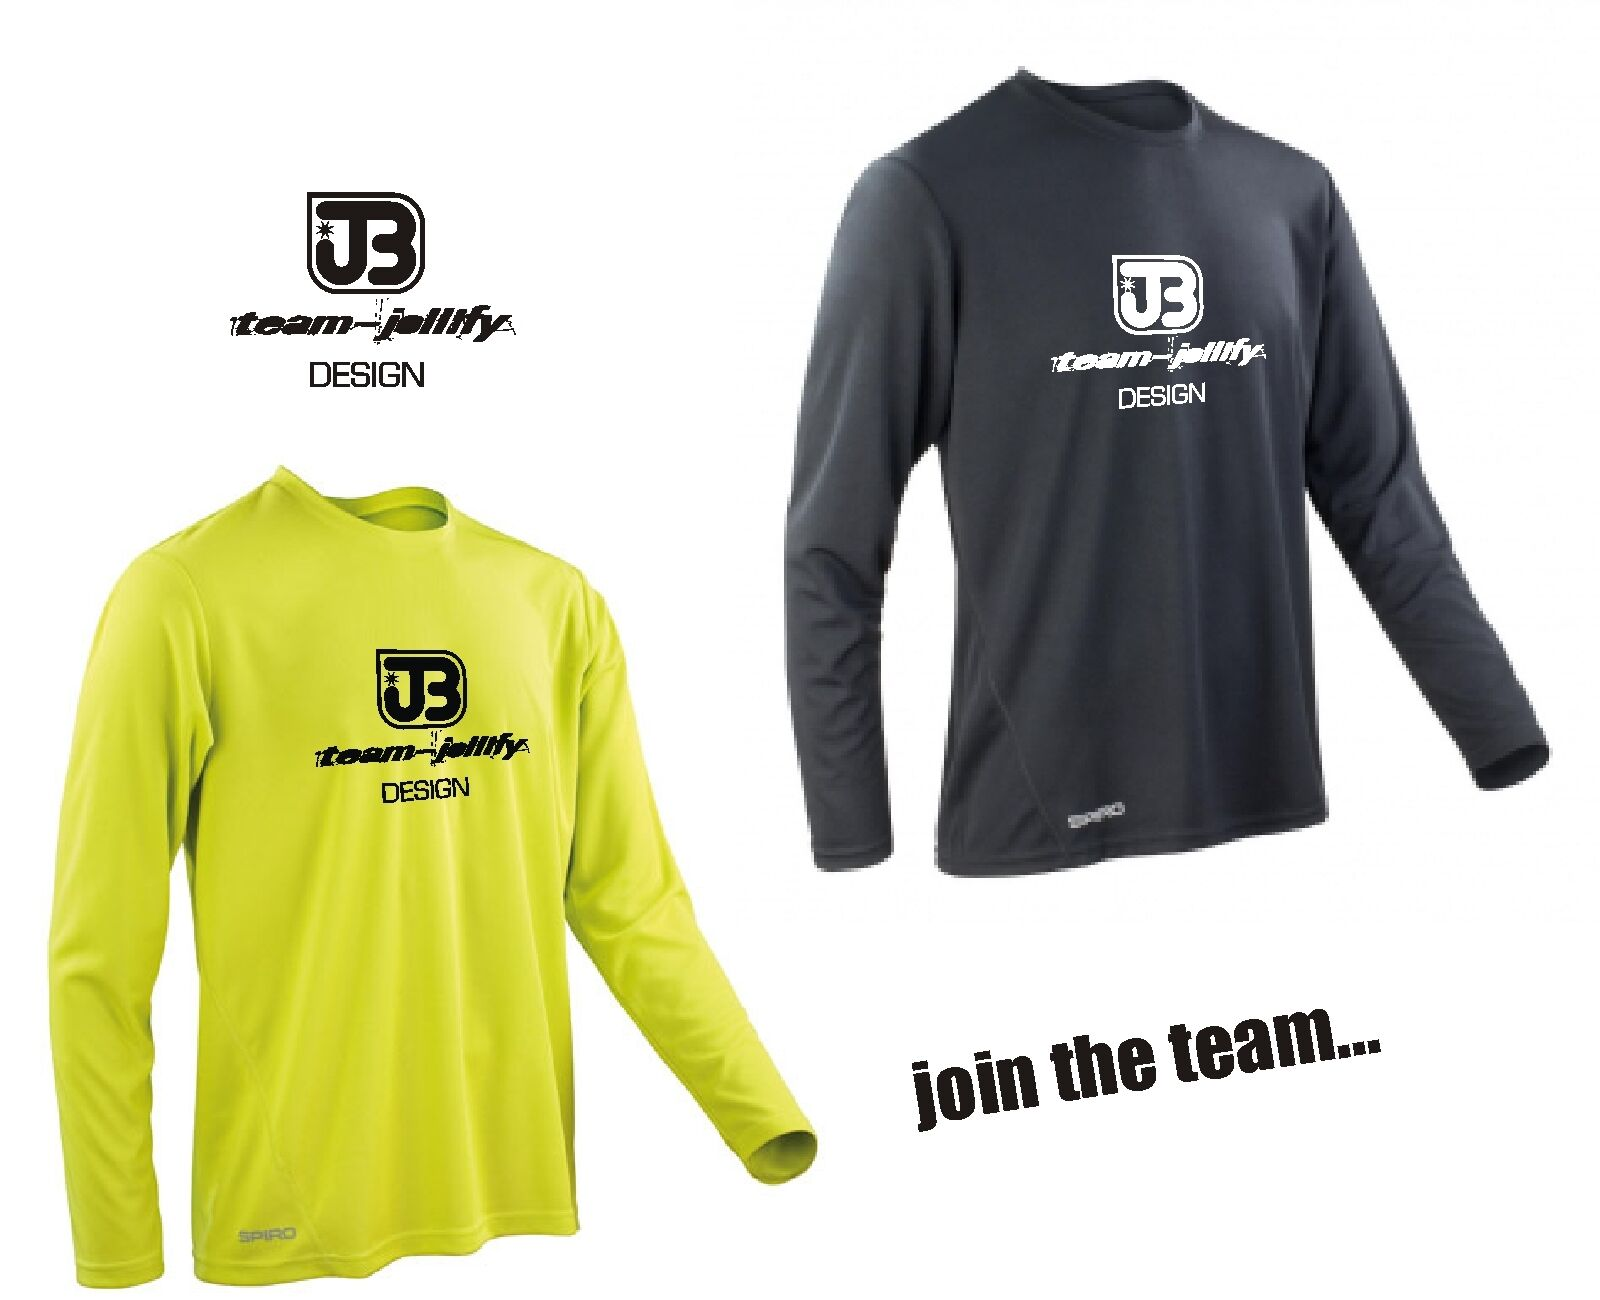 Team - jollify Design Trikot Jersey Shirt Downhill Freeride MTB Bike DH  Enduro 919fee348